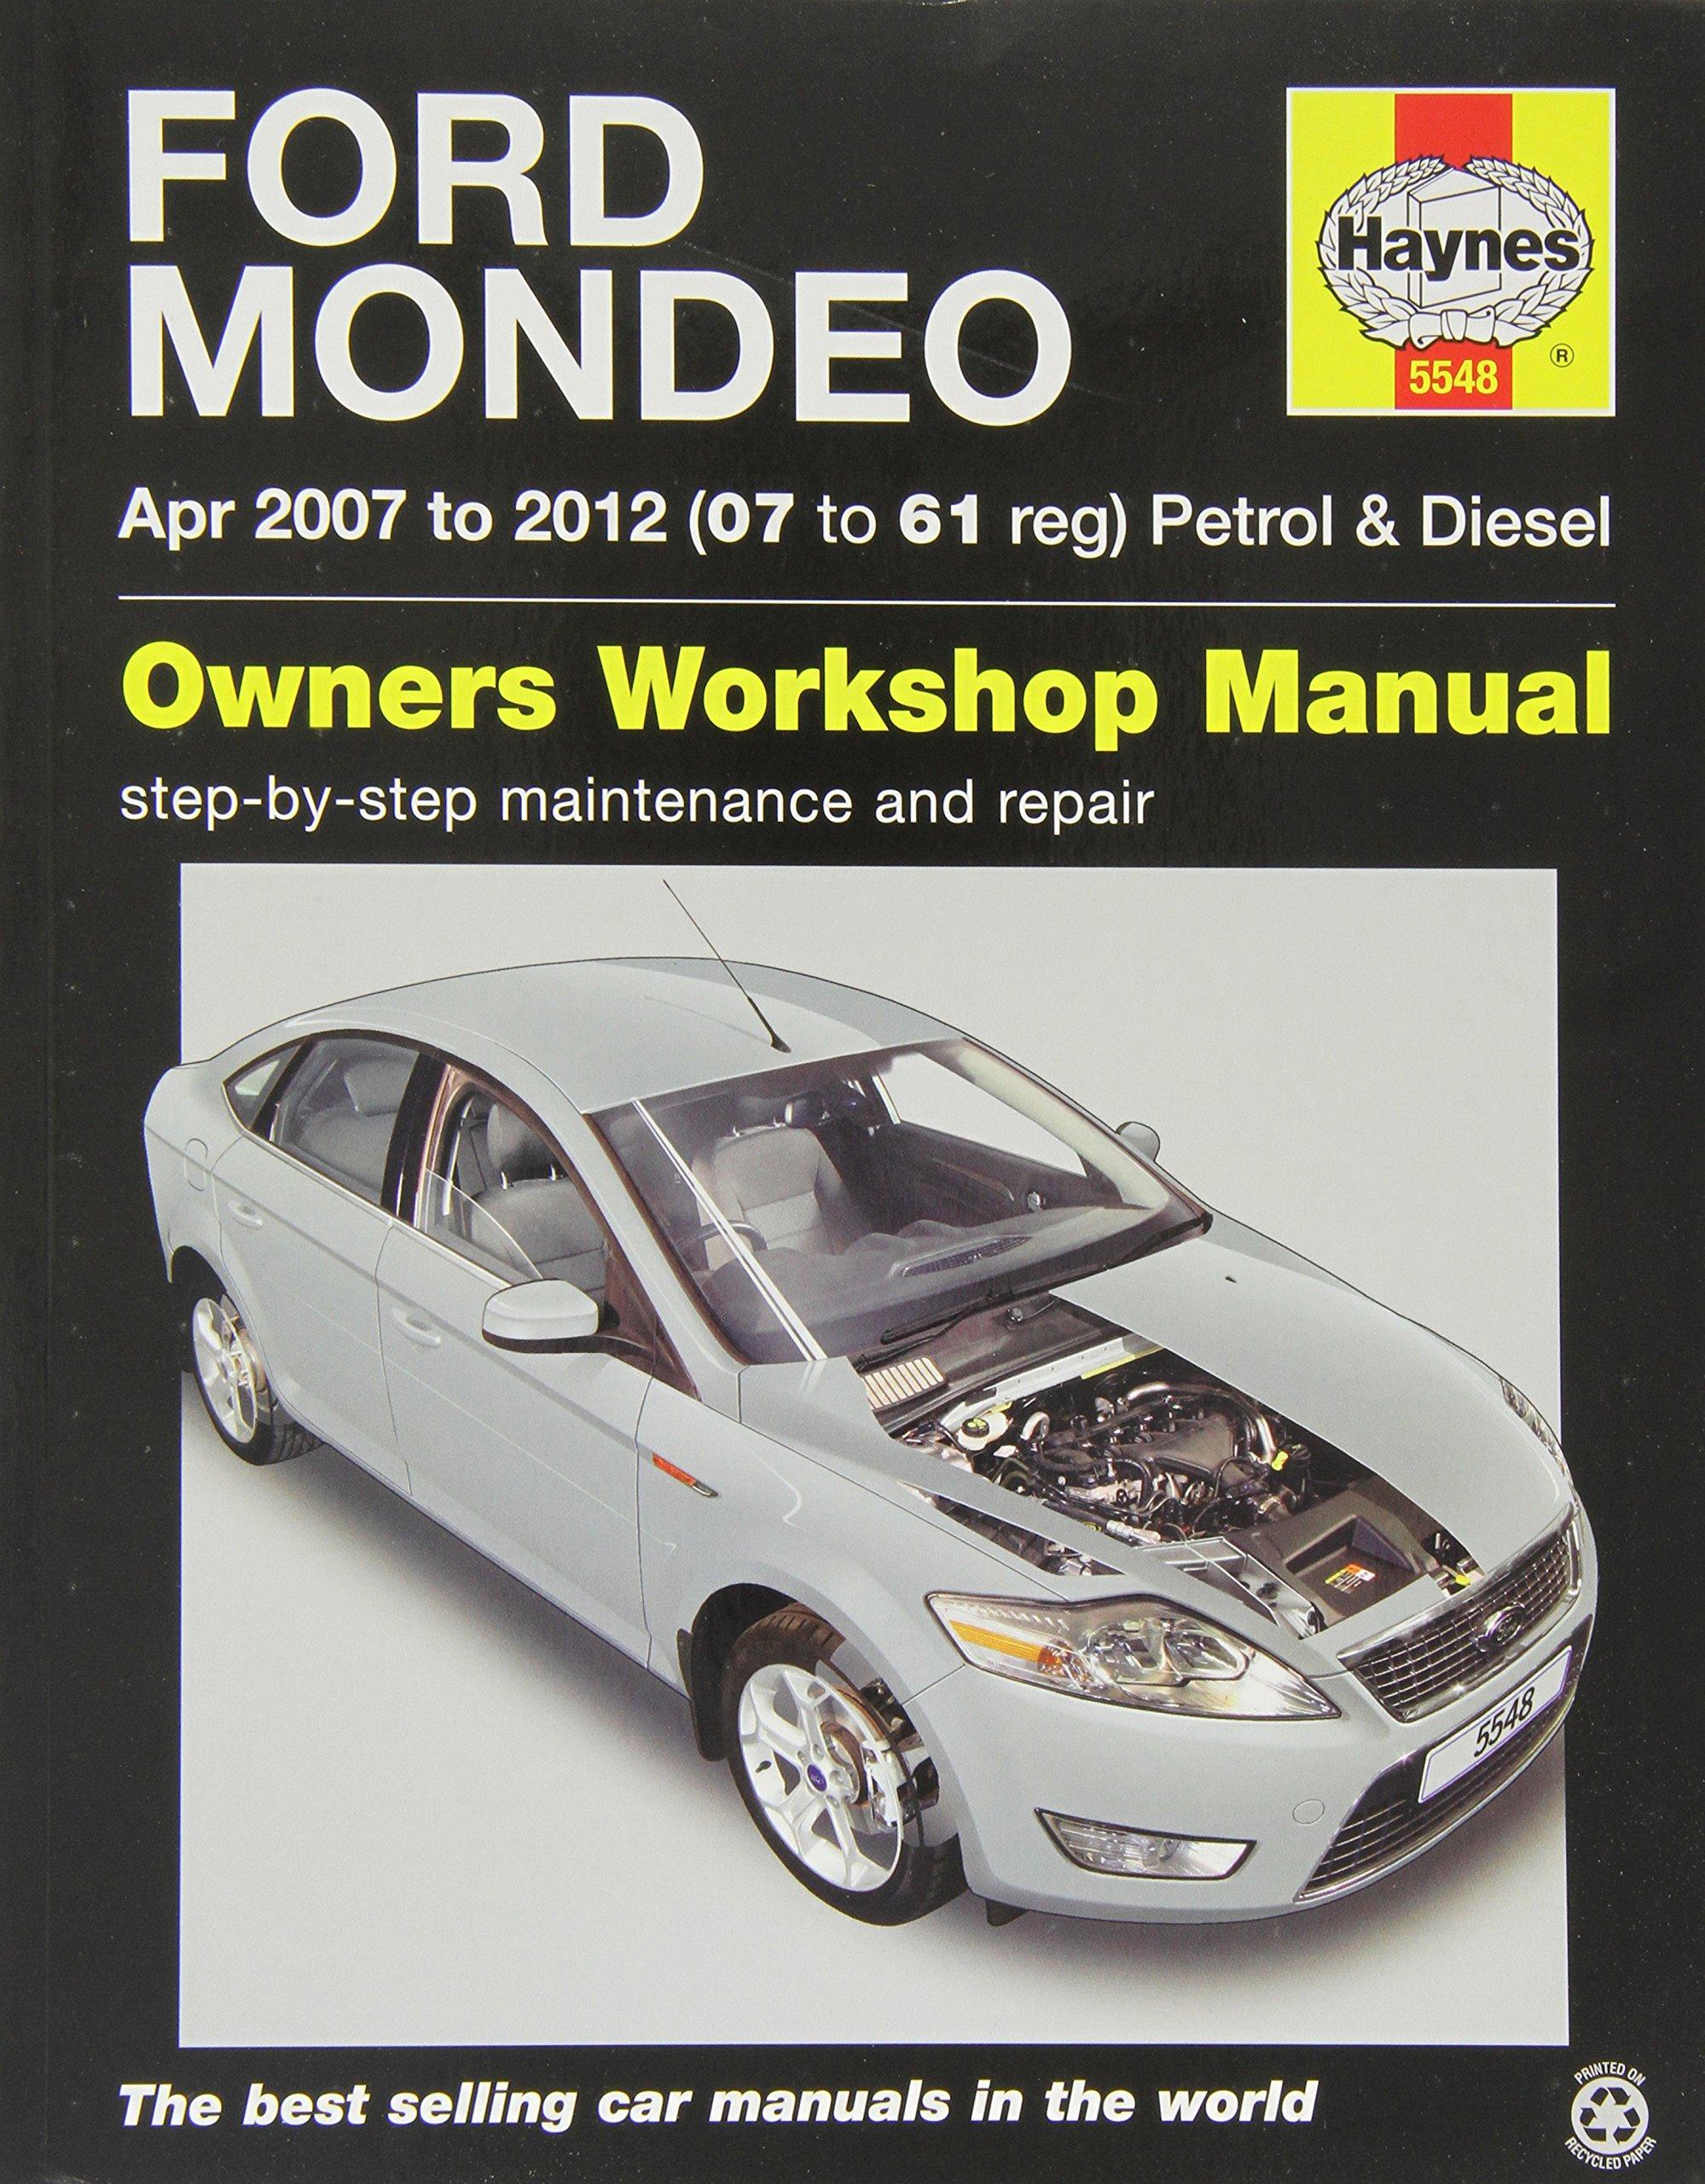 Haynes 5548 Service and Repair Workshop Manual: Amazon.co.uk:  0638876409629: Books